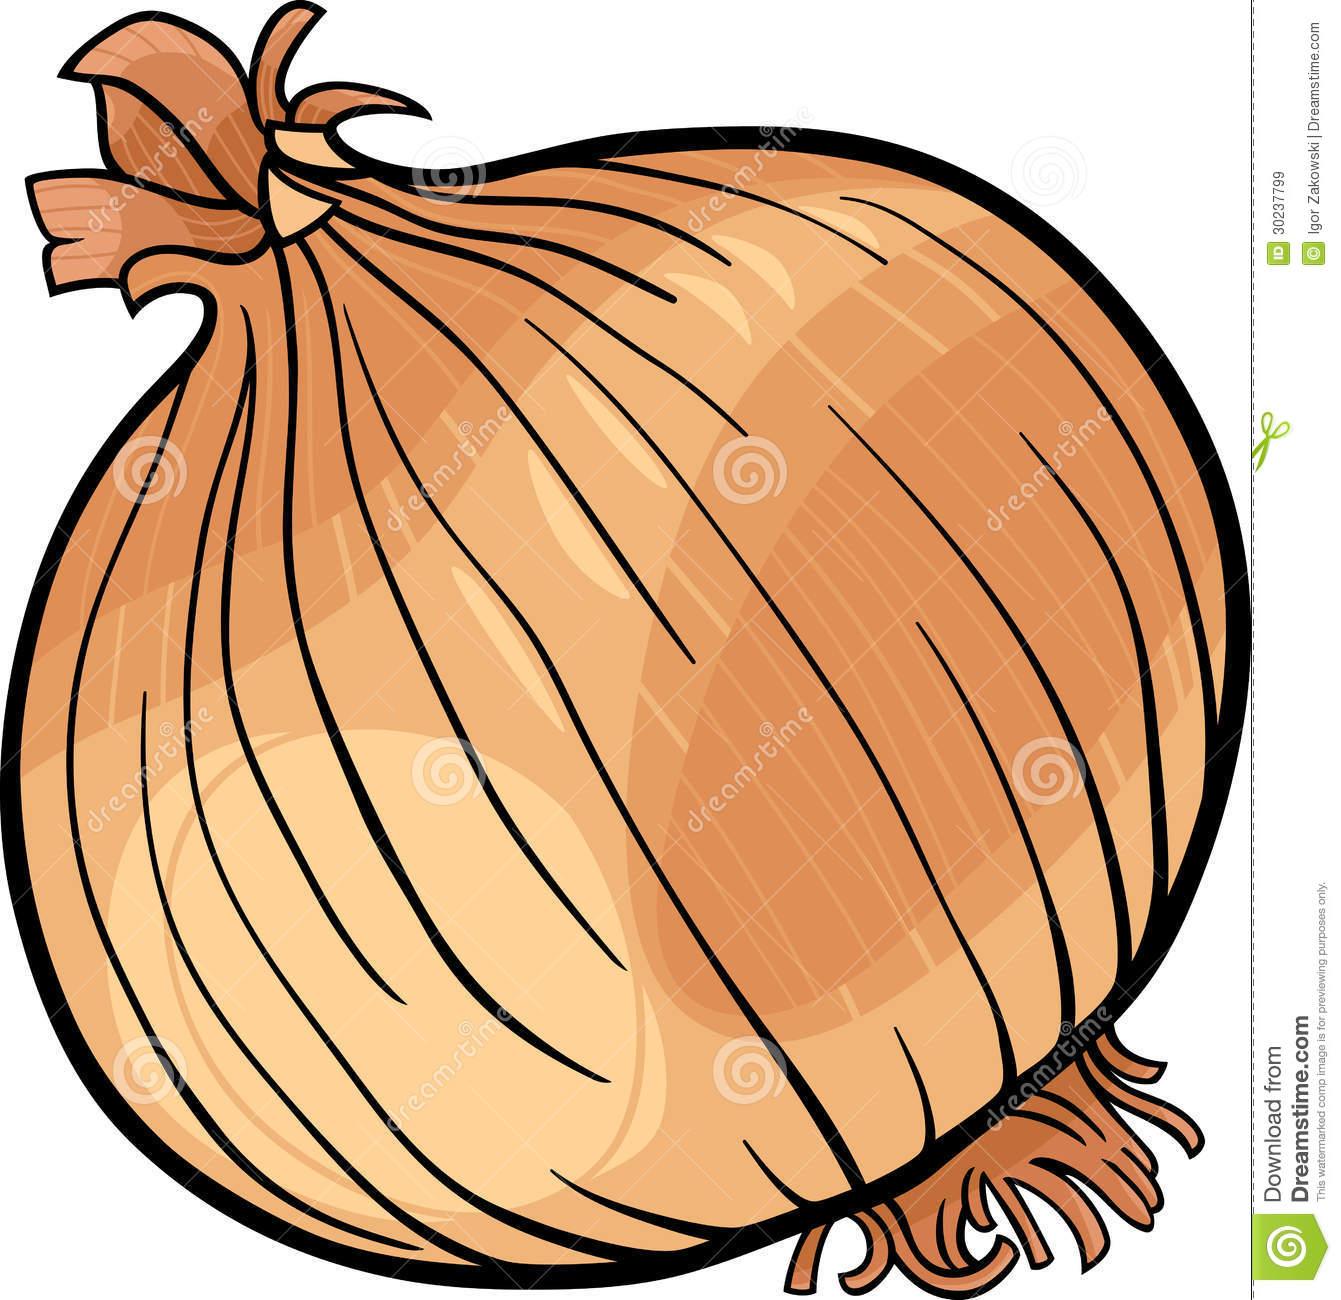 Onion Vegetable Cartoon Illustration Royalty Free Stock Images.